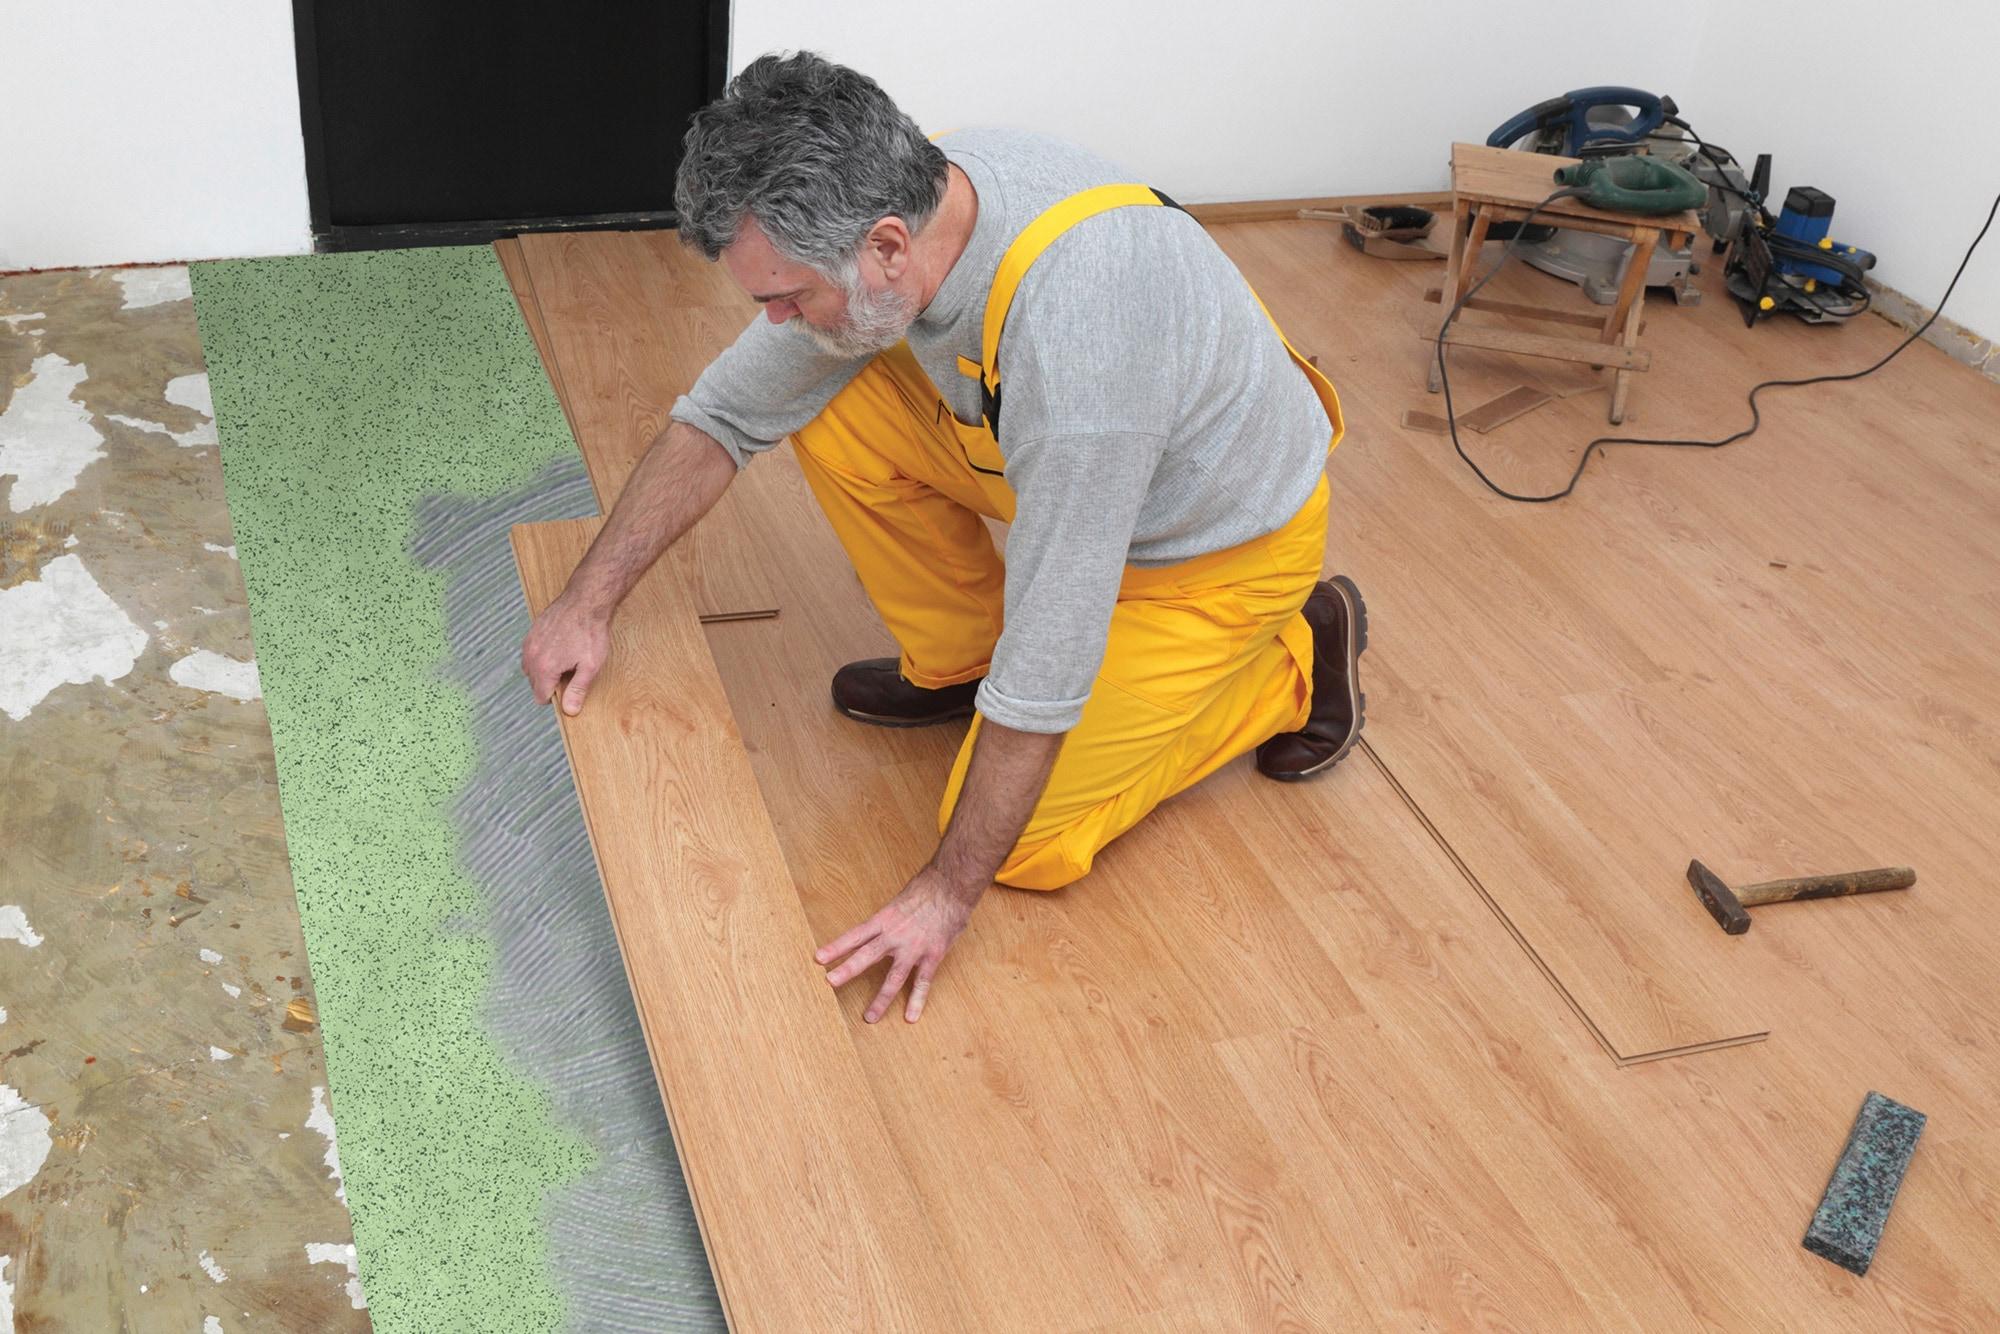 Baylis Sound Reduction Underlayment High Density Wood/Laminate Foam Underlayment - 100 sq ft Roll